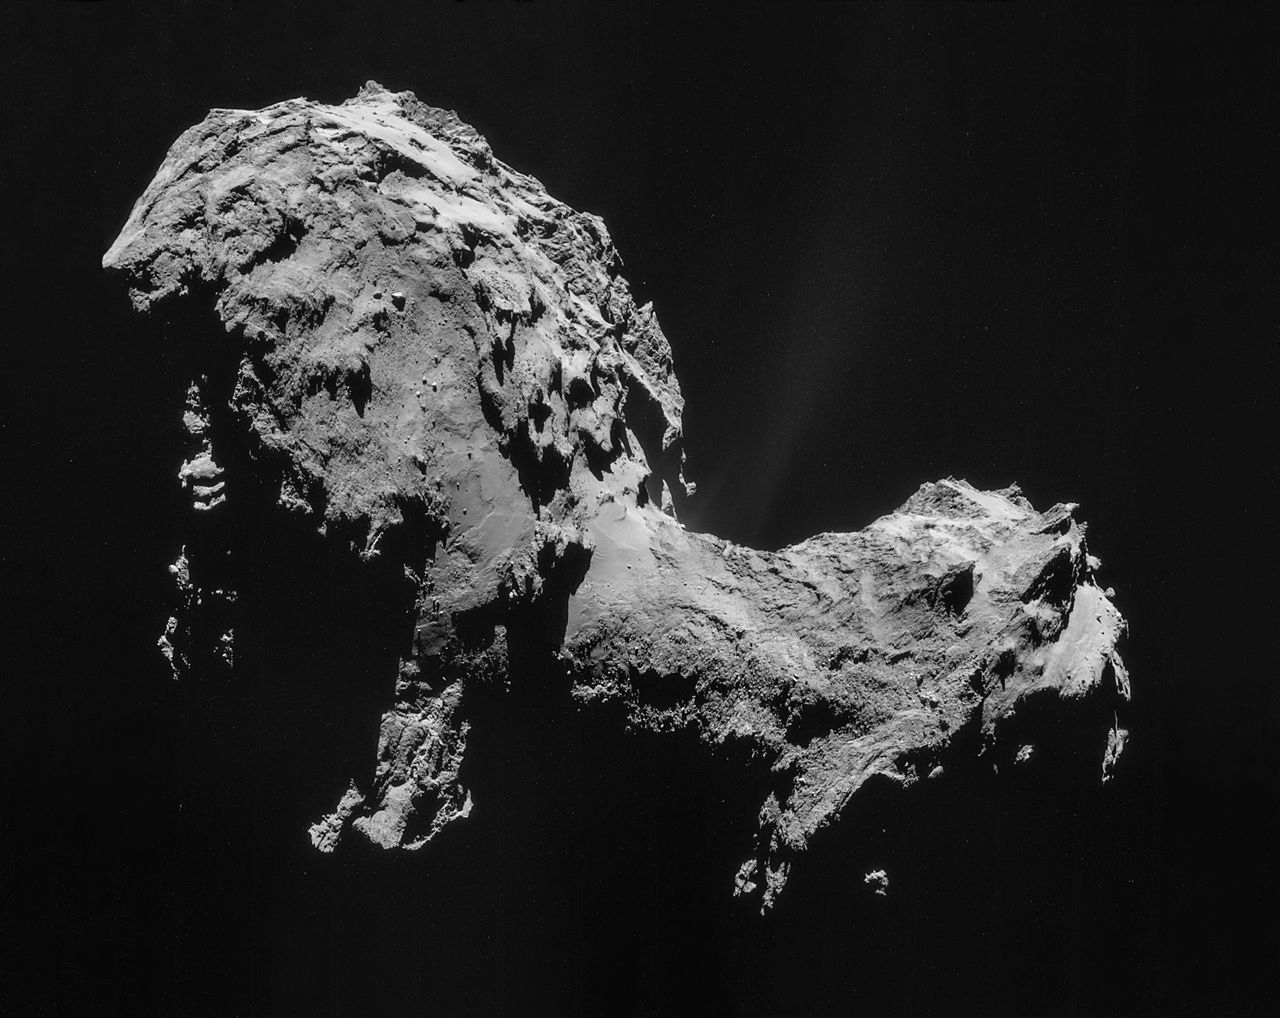 Rosetta et Philae : un immense succès, mais...